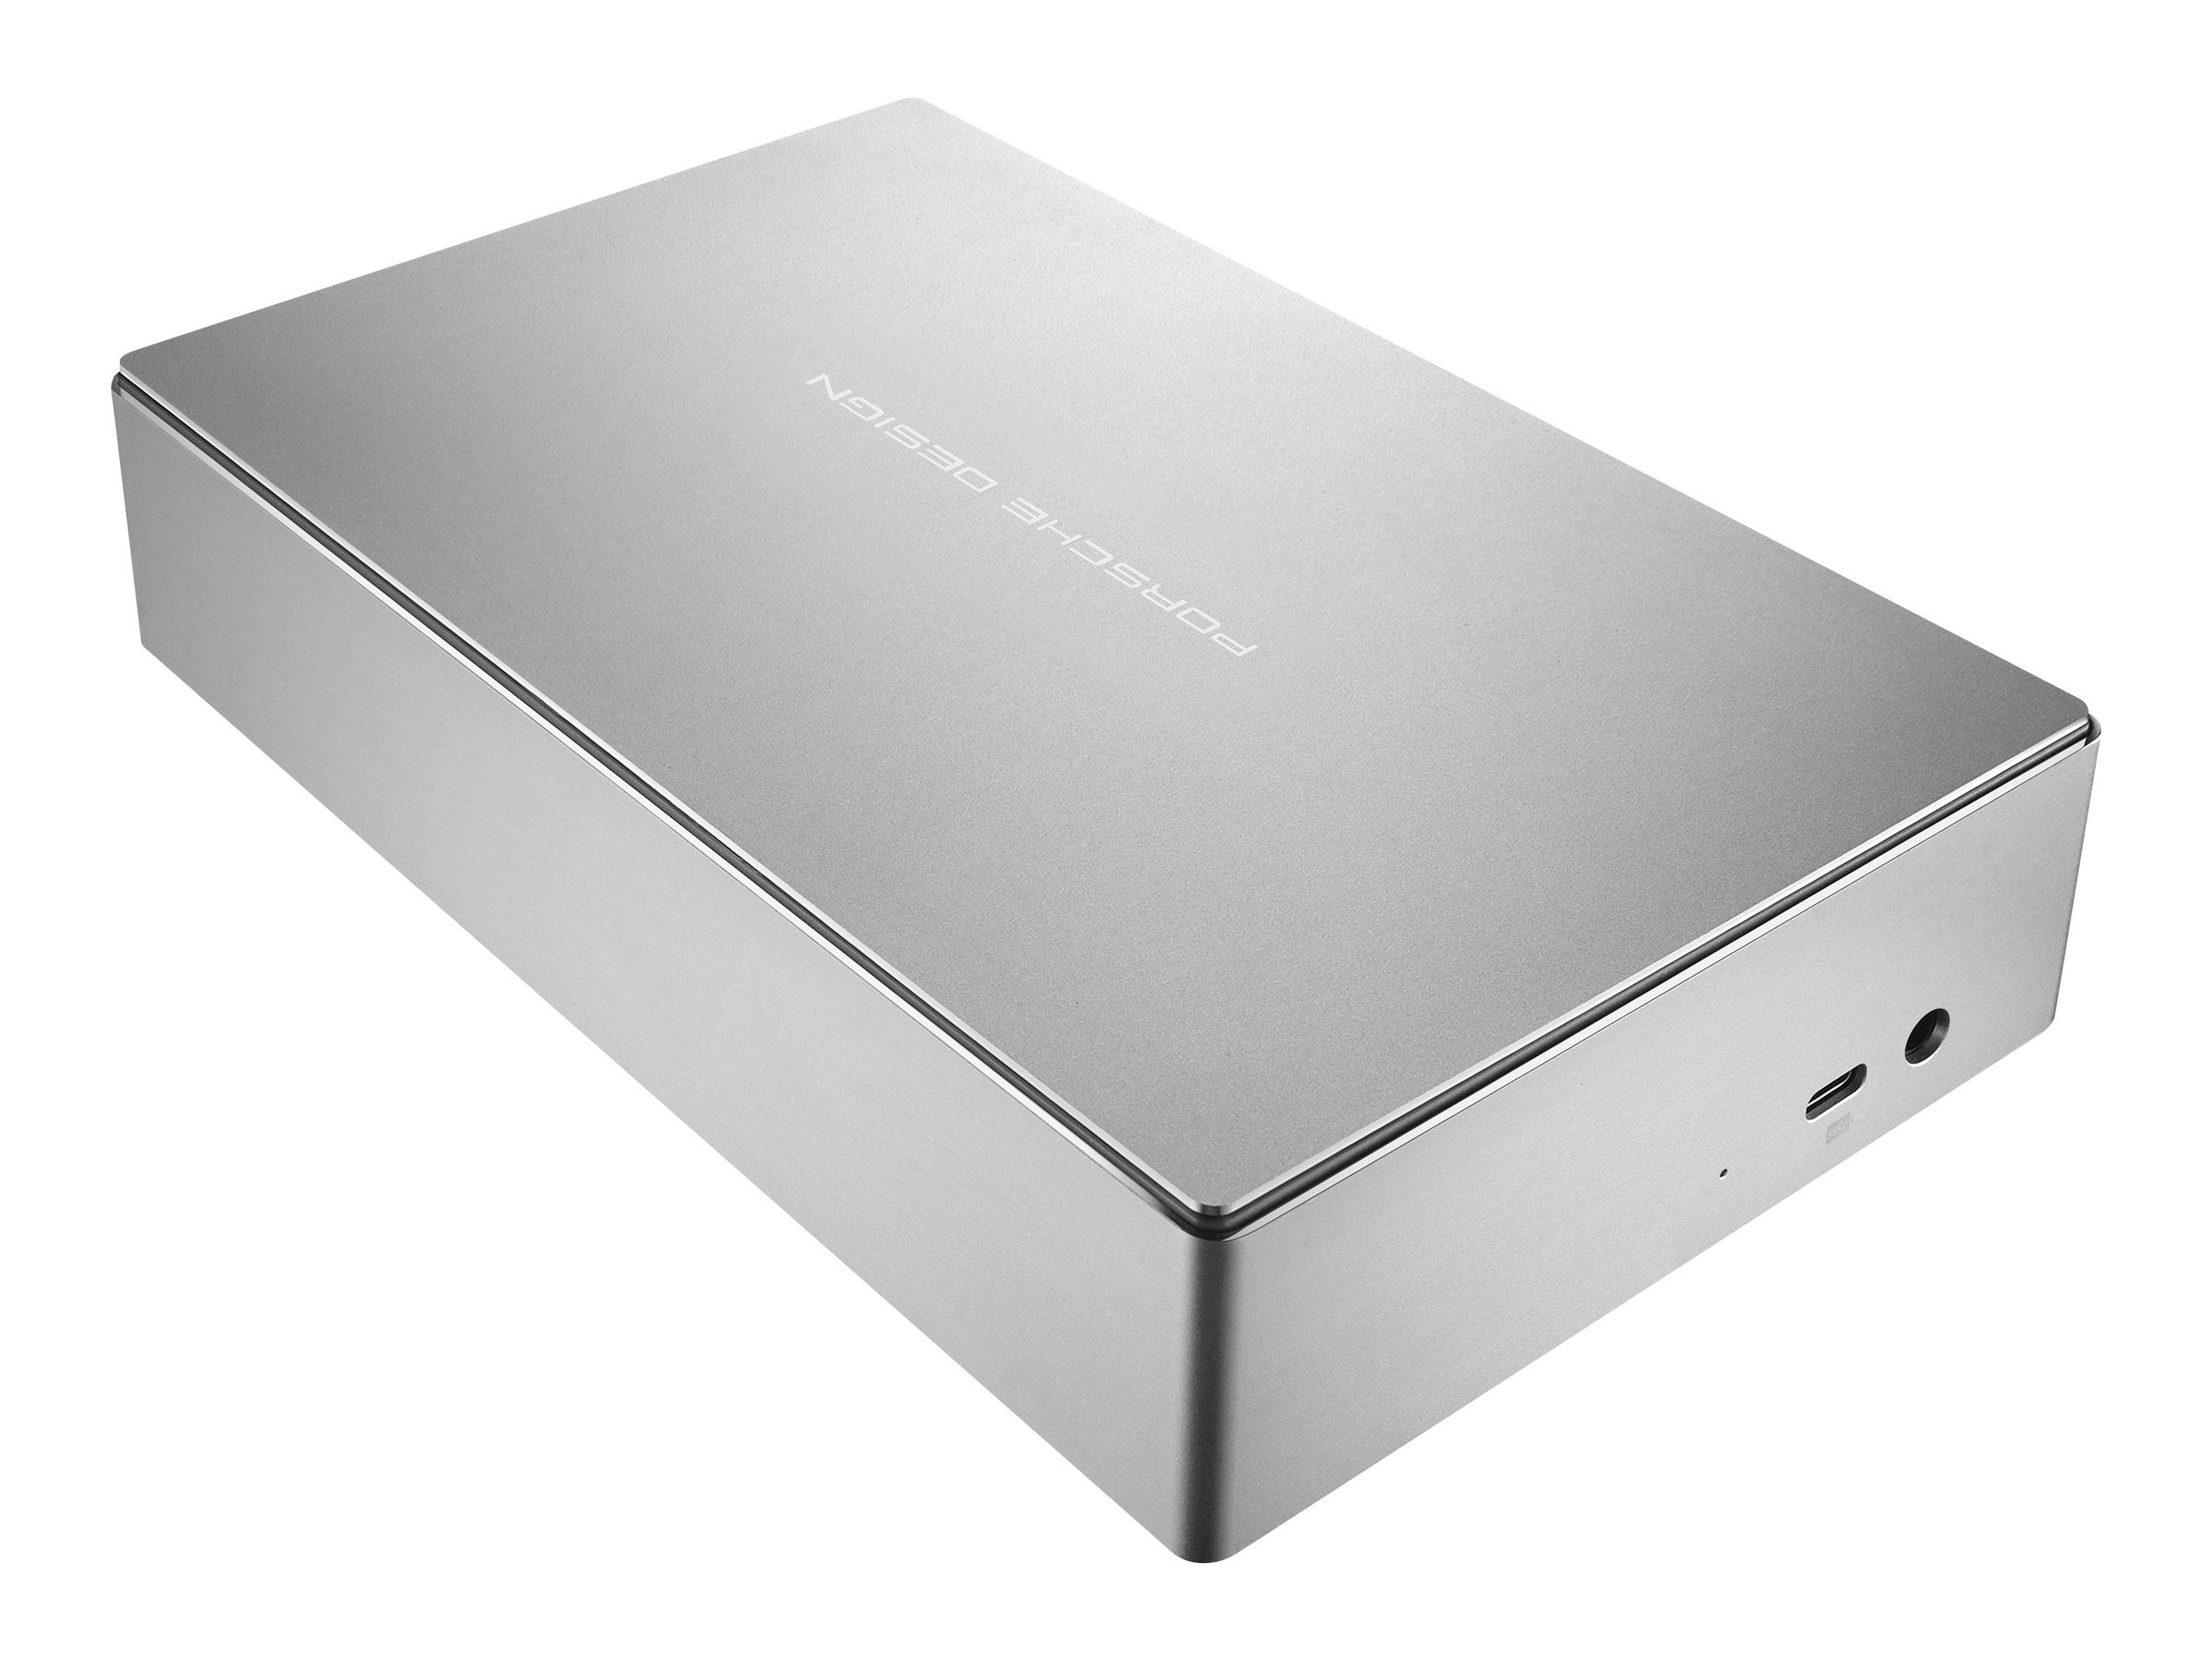 LaCie Porsche Design Desktop Drive STFE6000401 - Festplatte - 6 TB - extern (Stationär) - USB 3.1